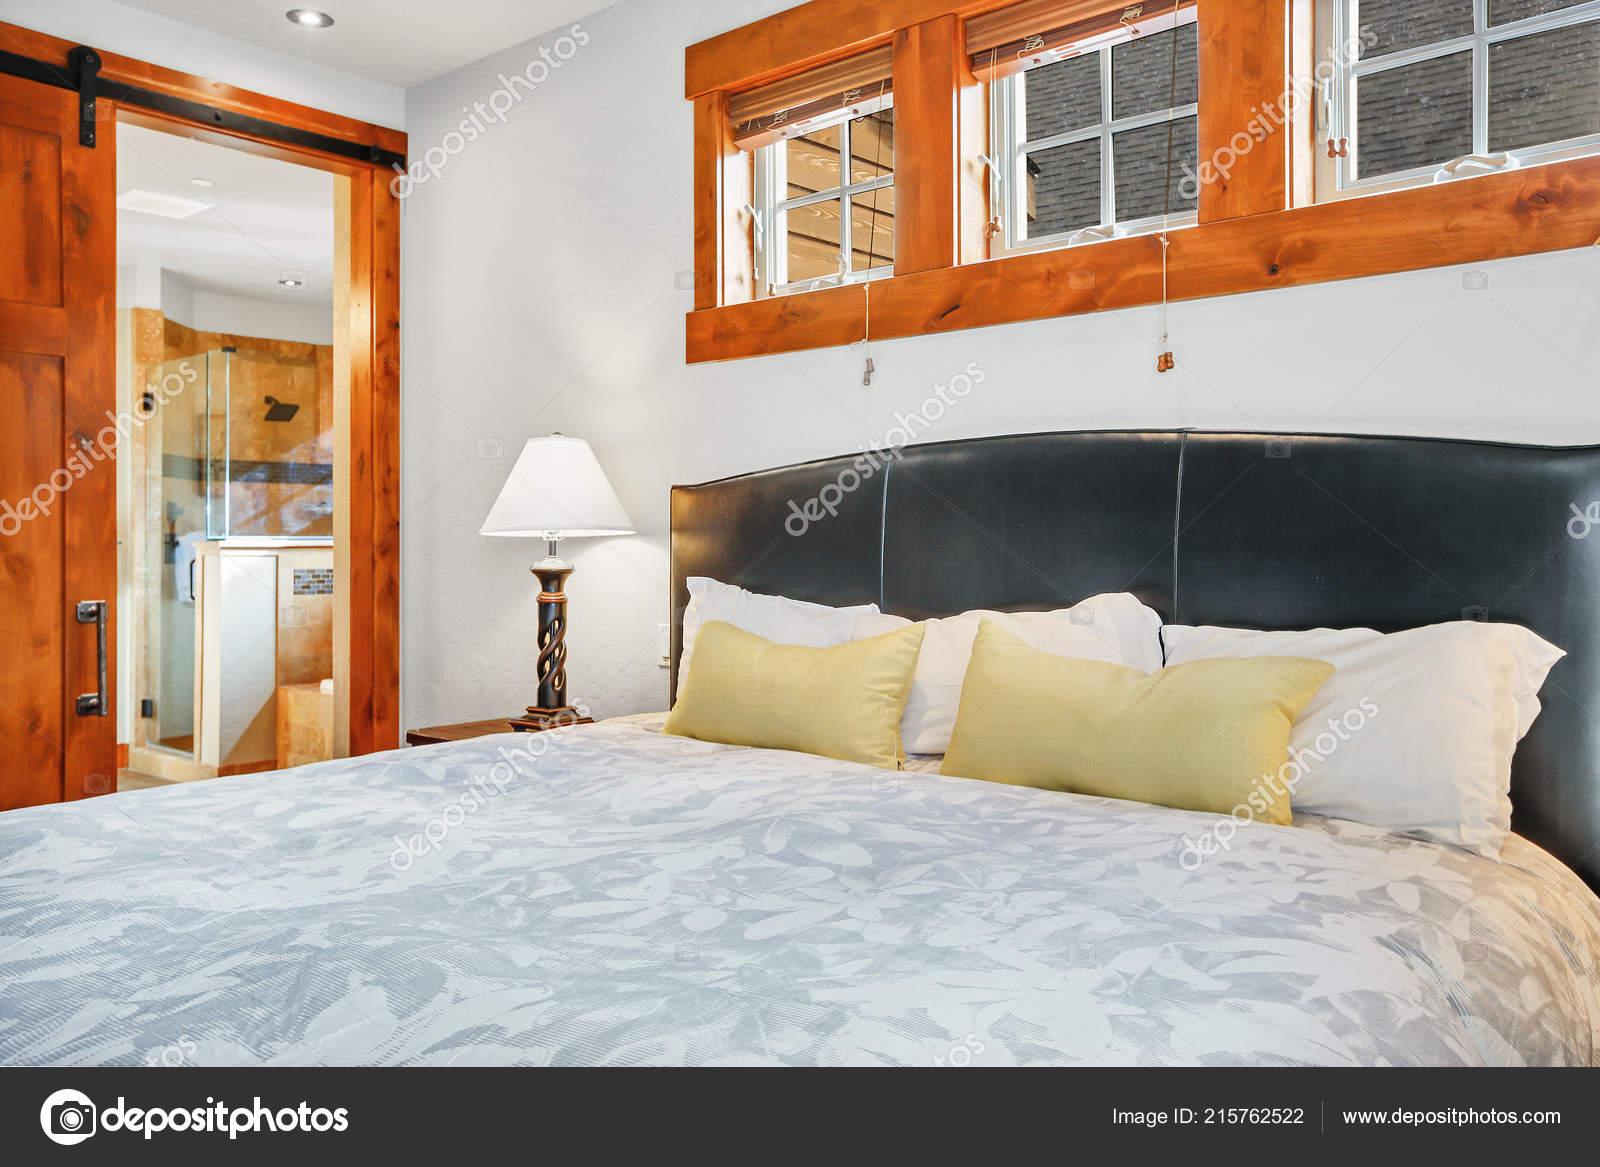 Gorgeous Master Bedroom Interior Leather Headboard Wood Trim Barn Doors Stock Photo C Iriana88w 215762522